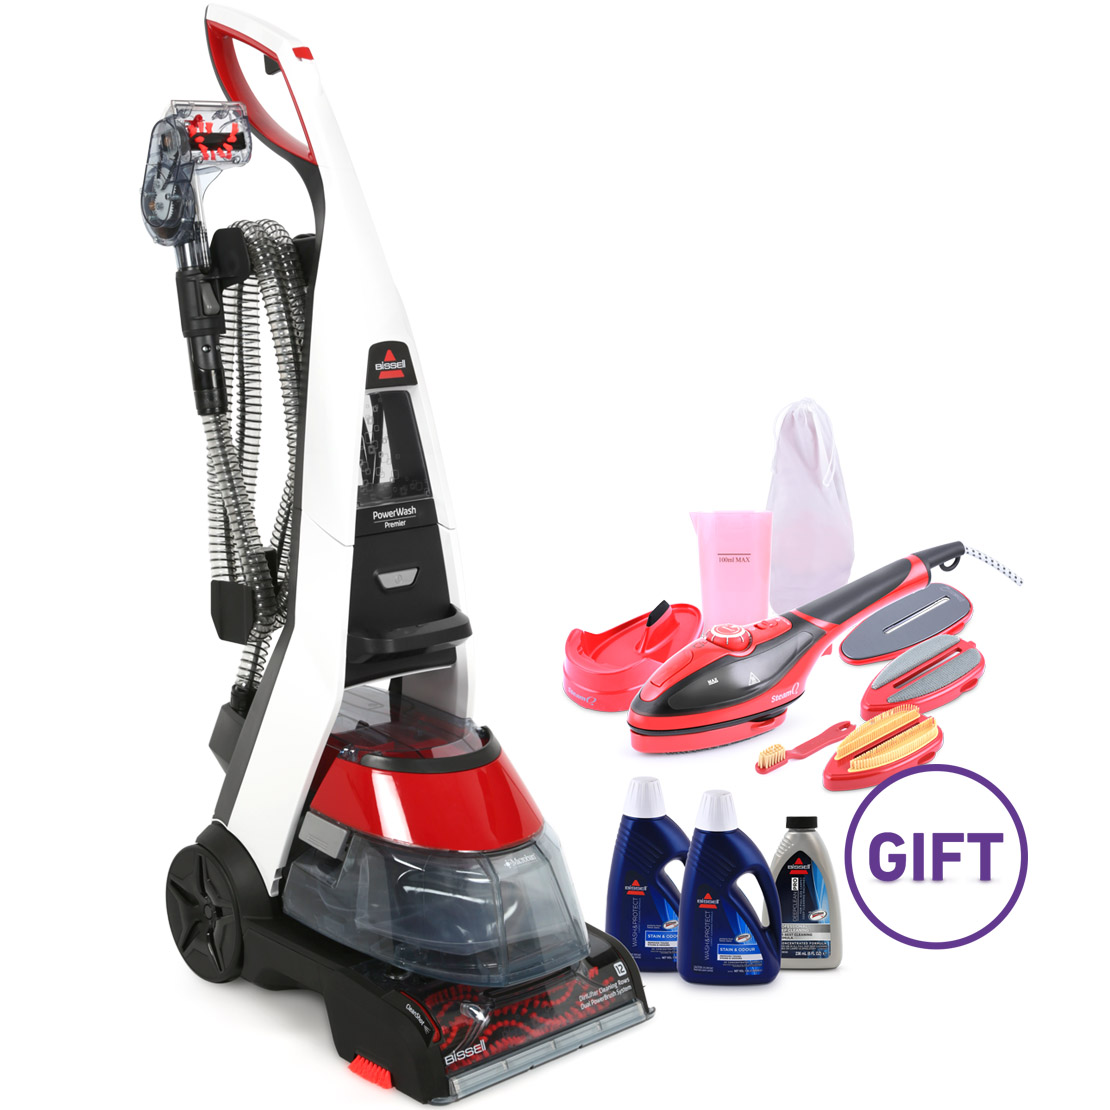 Deep Clean Premier Carpet Cleaner & Gifts